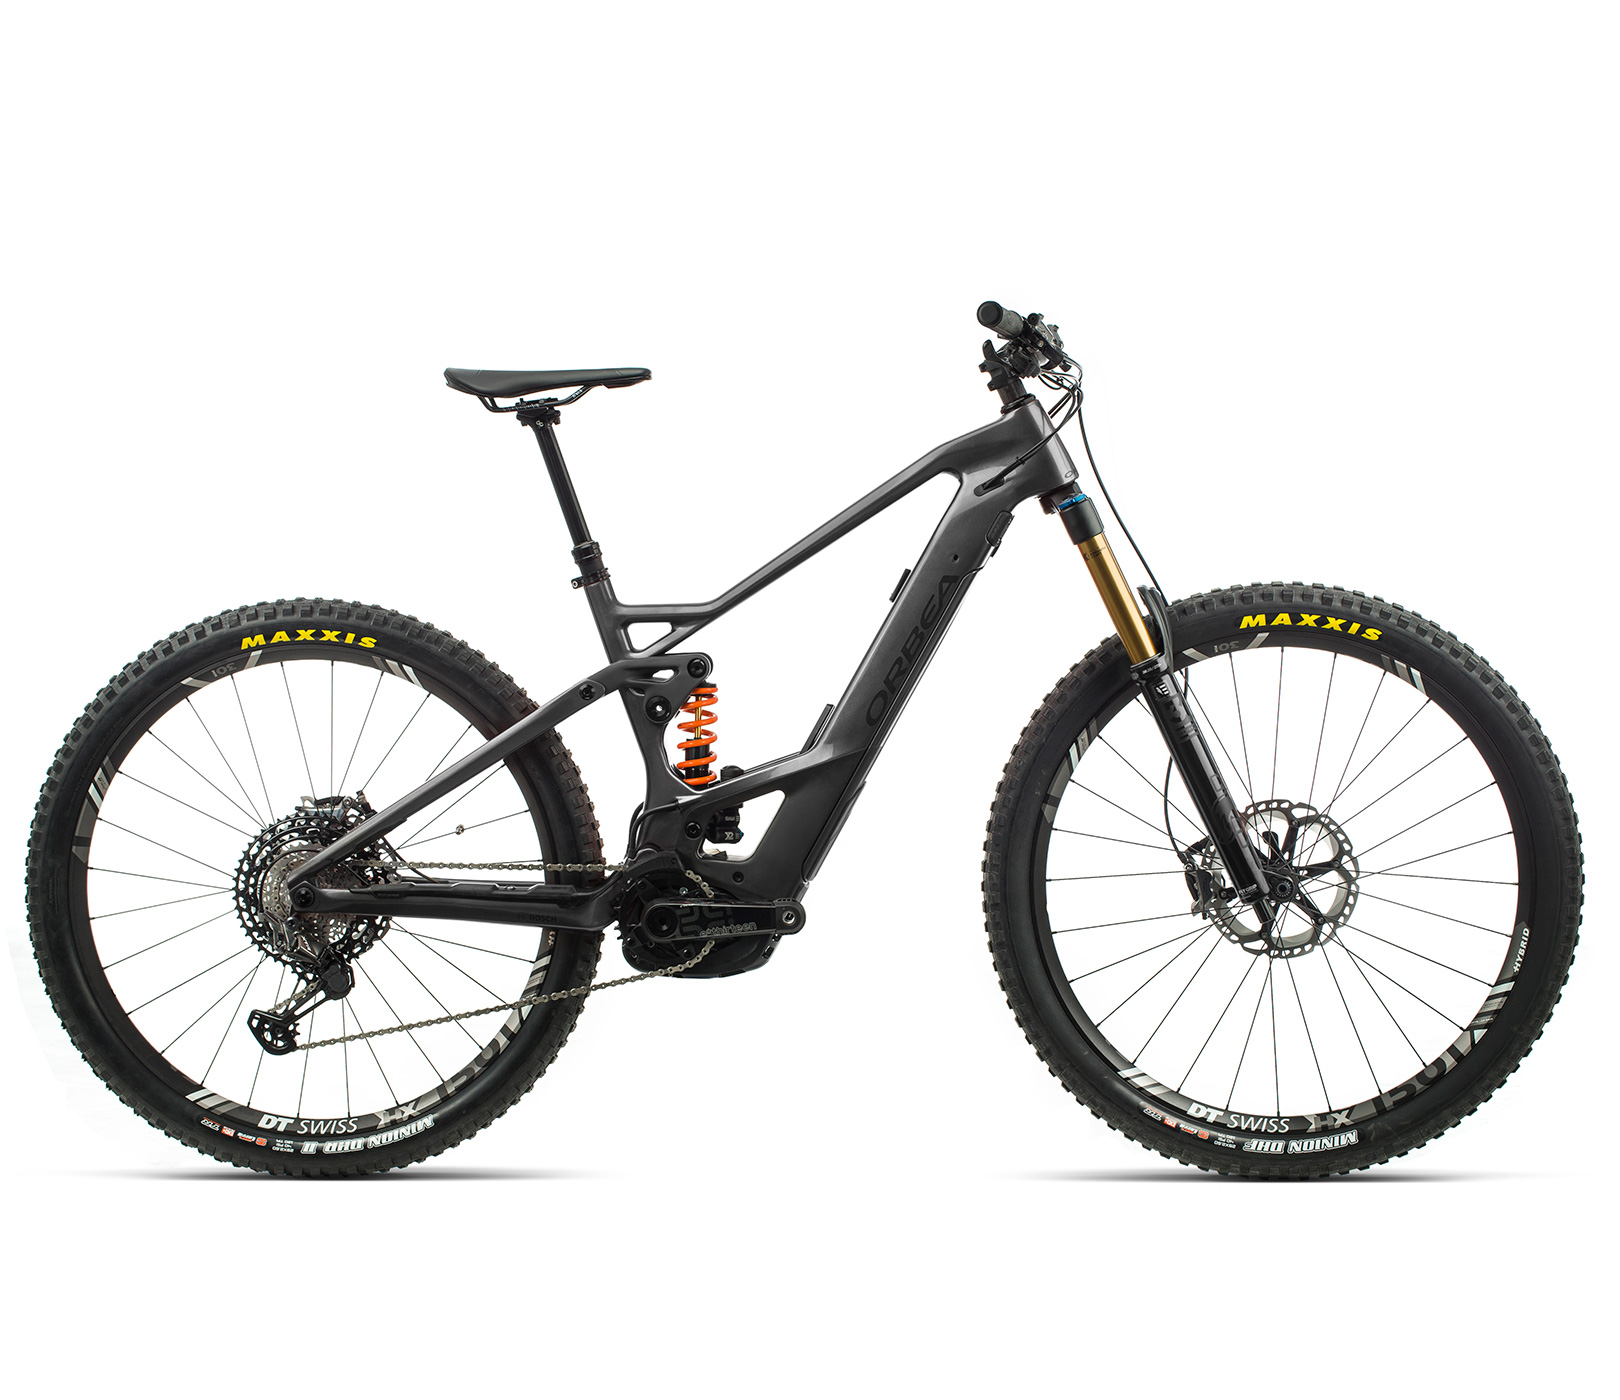 ORBEA WILD FS MLTD ebike - ANTRACIET GLITTER (GLOSS) / ZWART (DOF) @G-Bikes